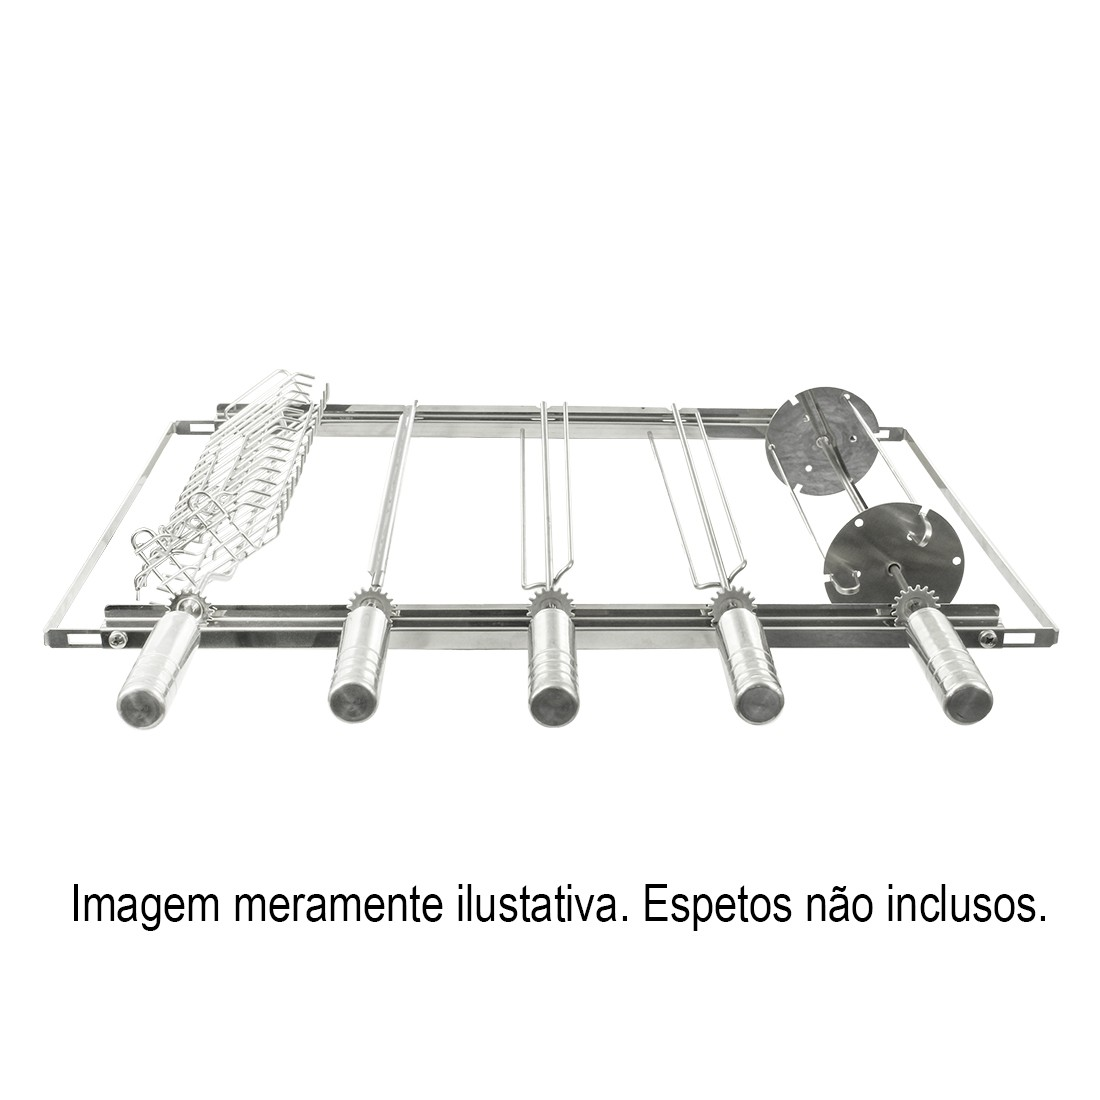 Giragrill Kit Suporte PM-5 Inox